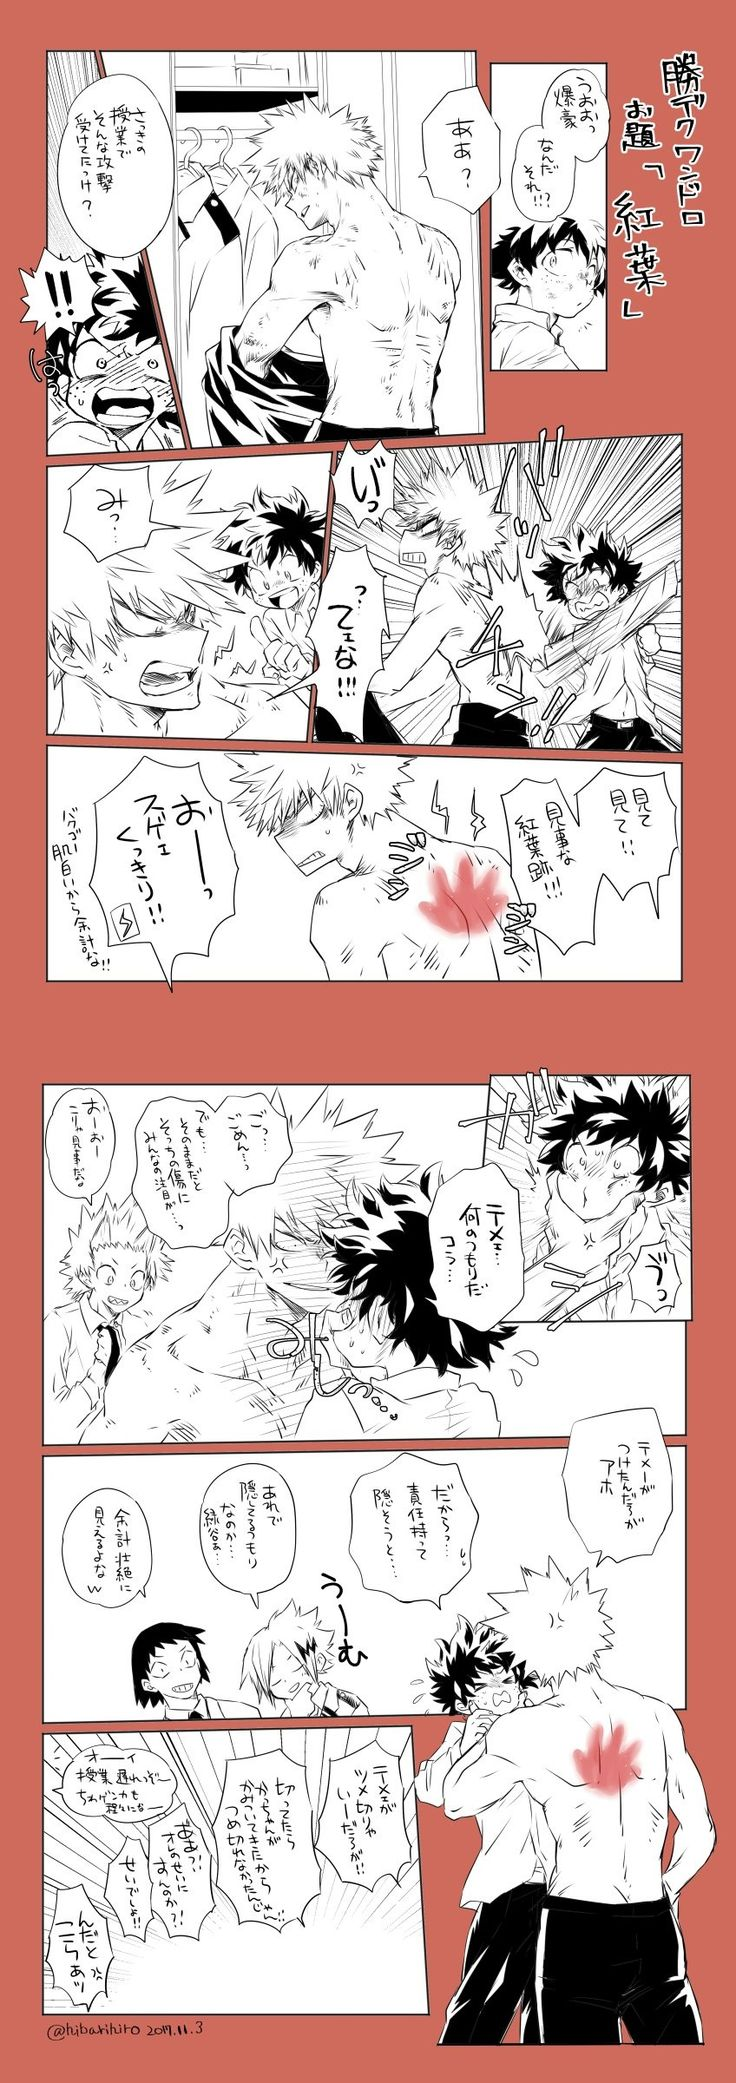 Bakugou Katsuki × Midoriya Izuku>>>> idk whats going on but its funny